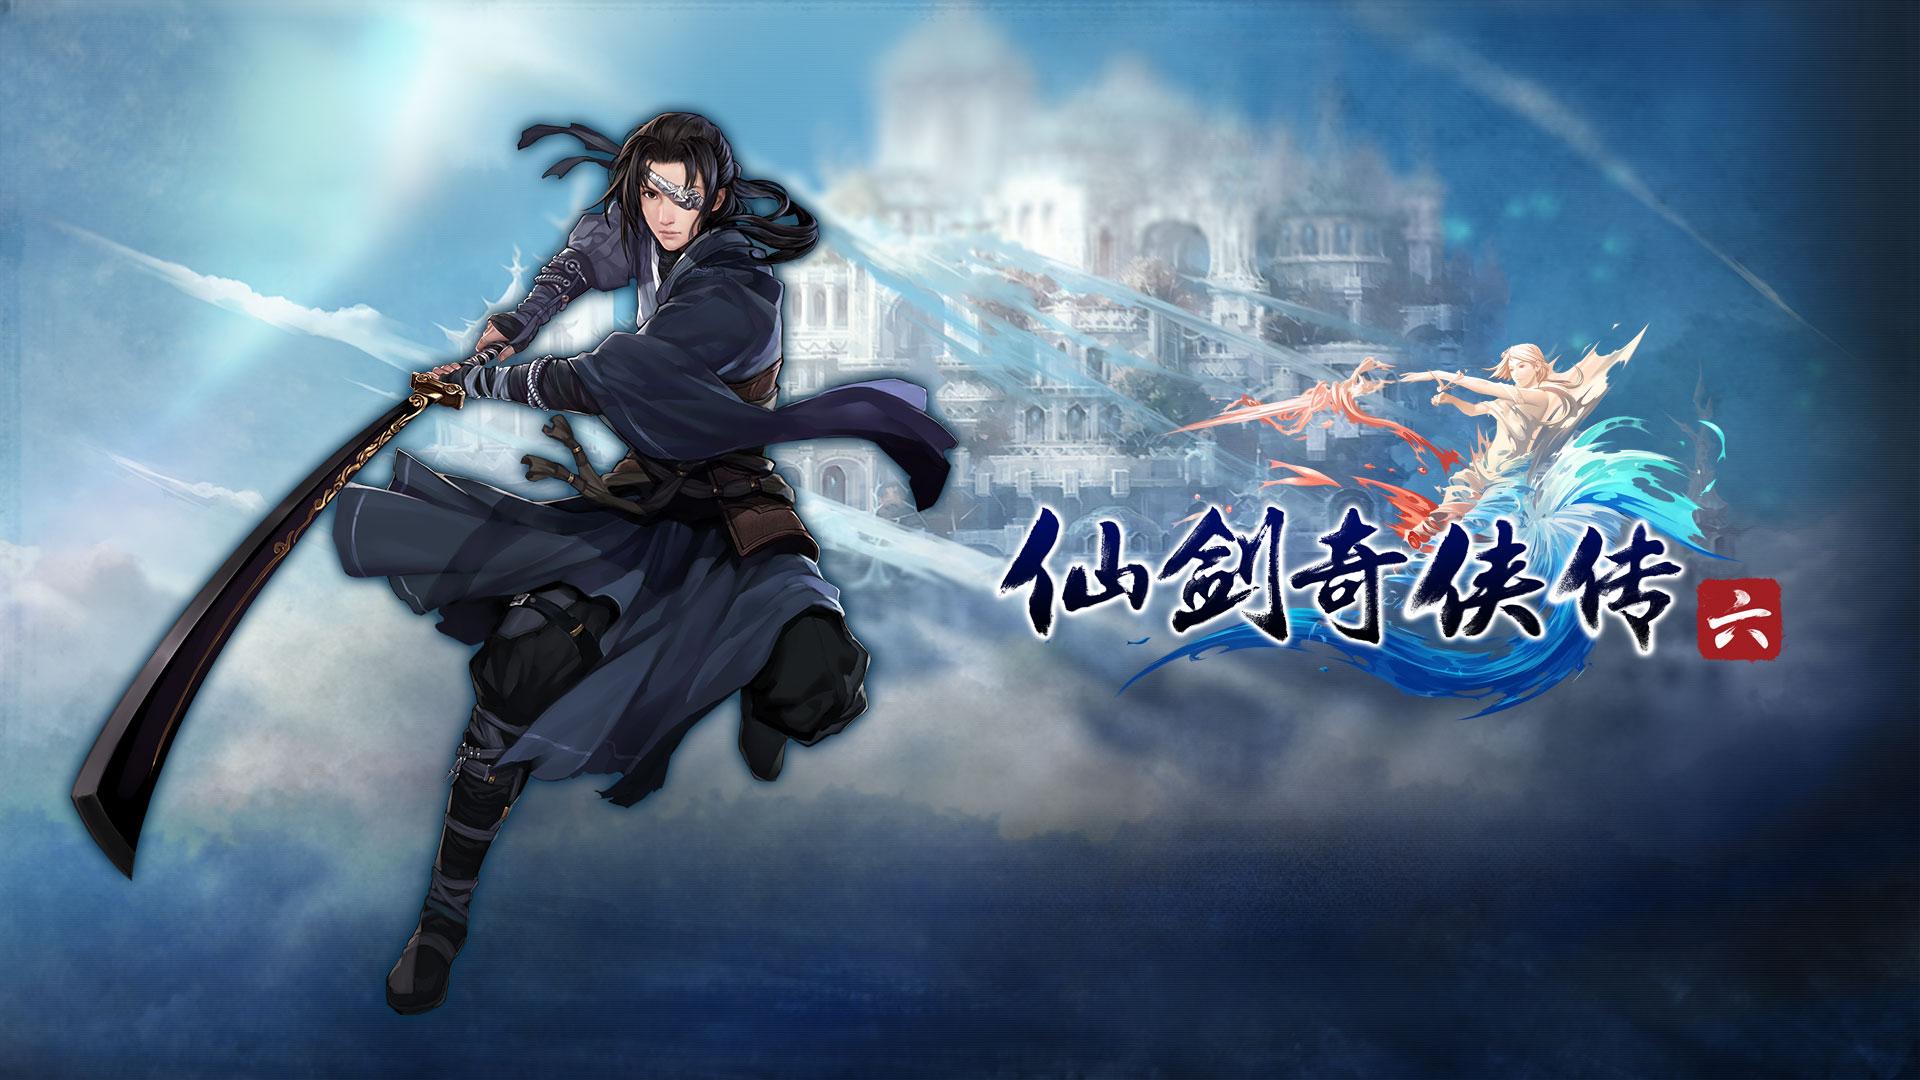 Showcase :: 仙剑奇侠传六(Chinese Paladin:Sword and Fairy 6)